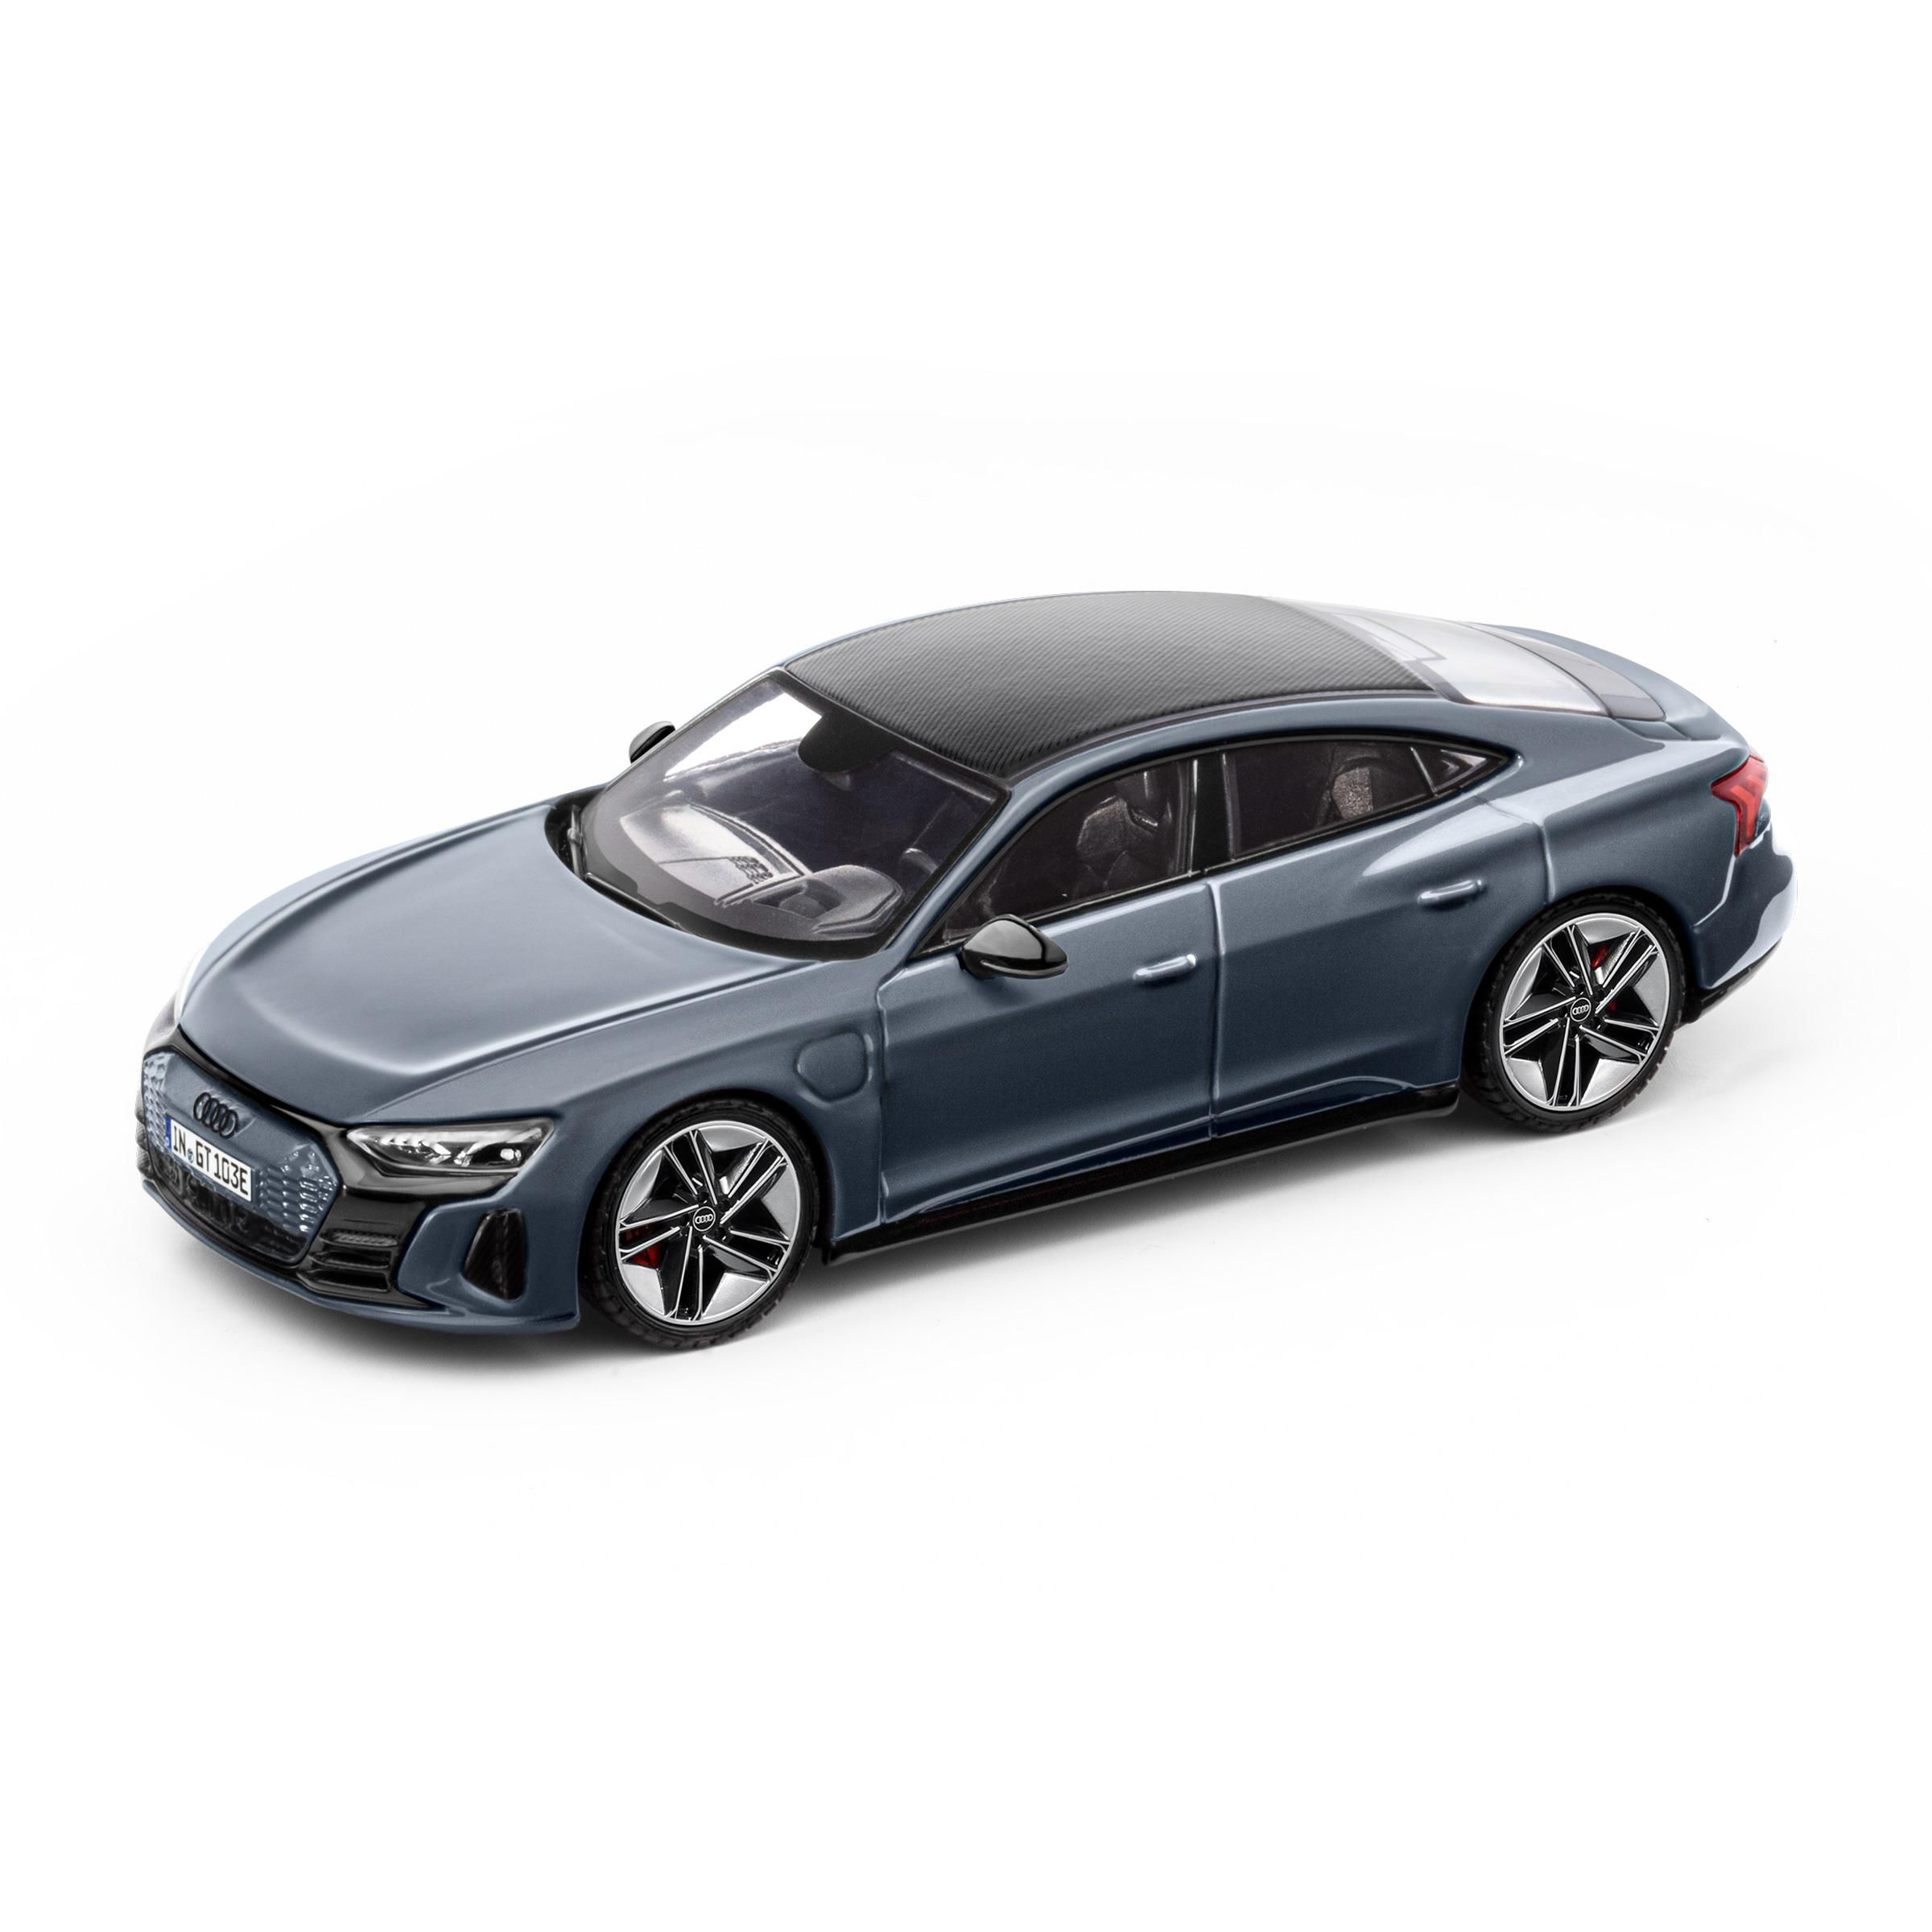 Audi e-tron GT Kemoragrau Modellauto 1:43